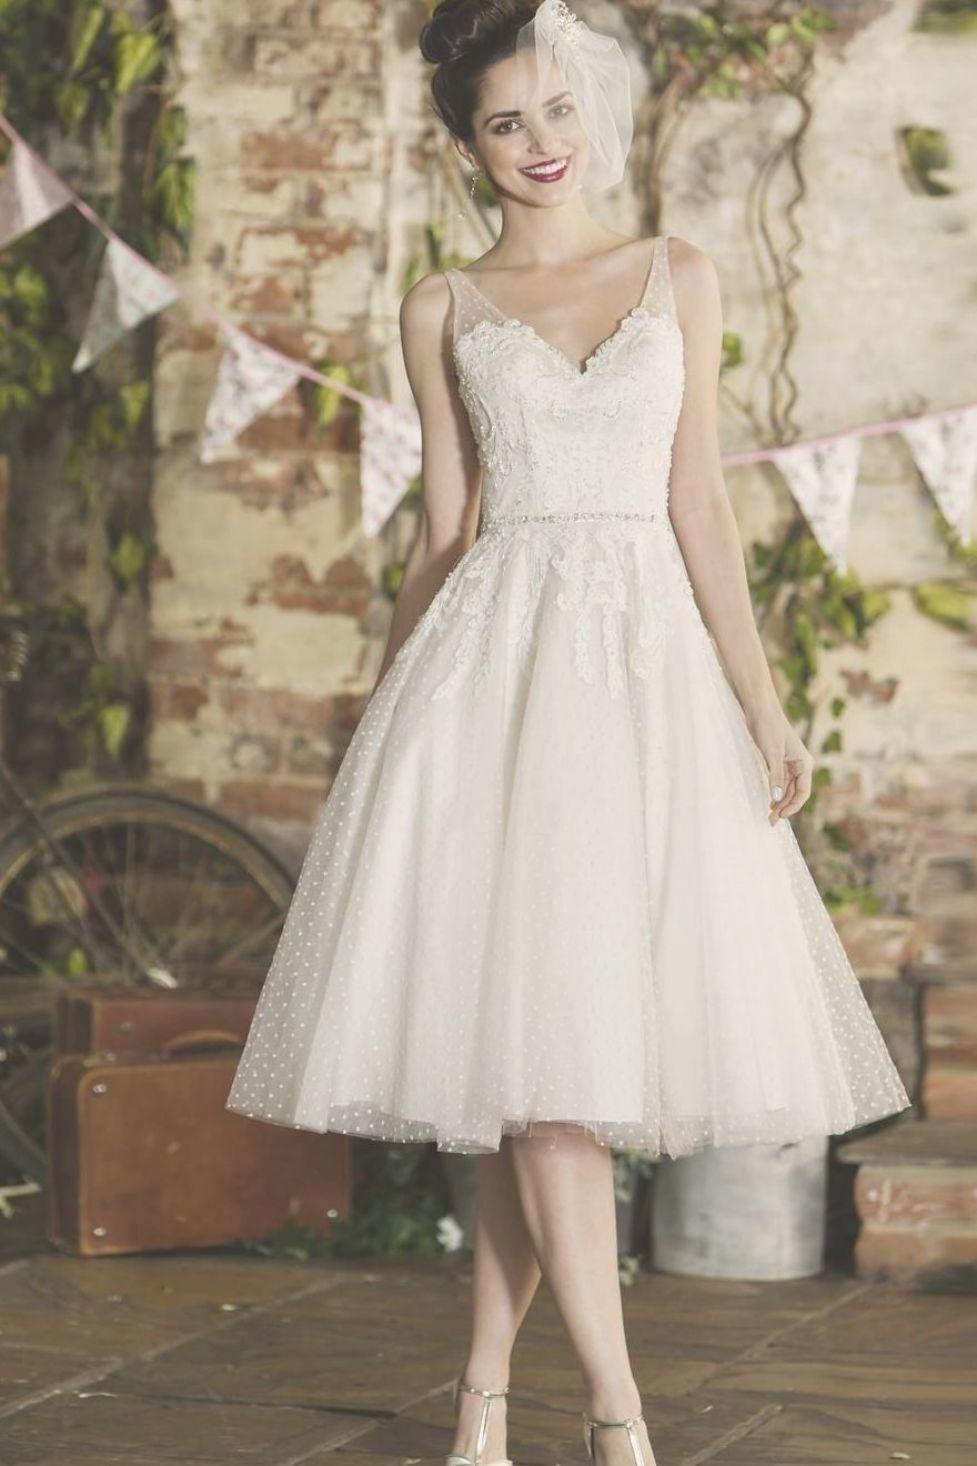 tbsadie Vintage inspired short tea length wedding dress